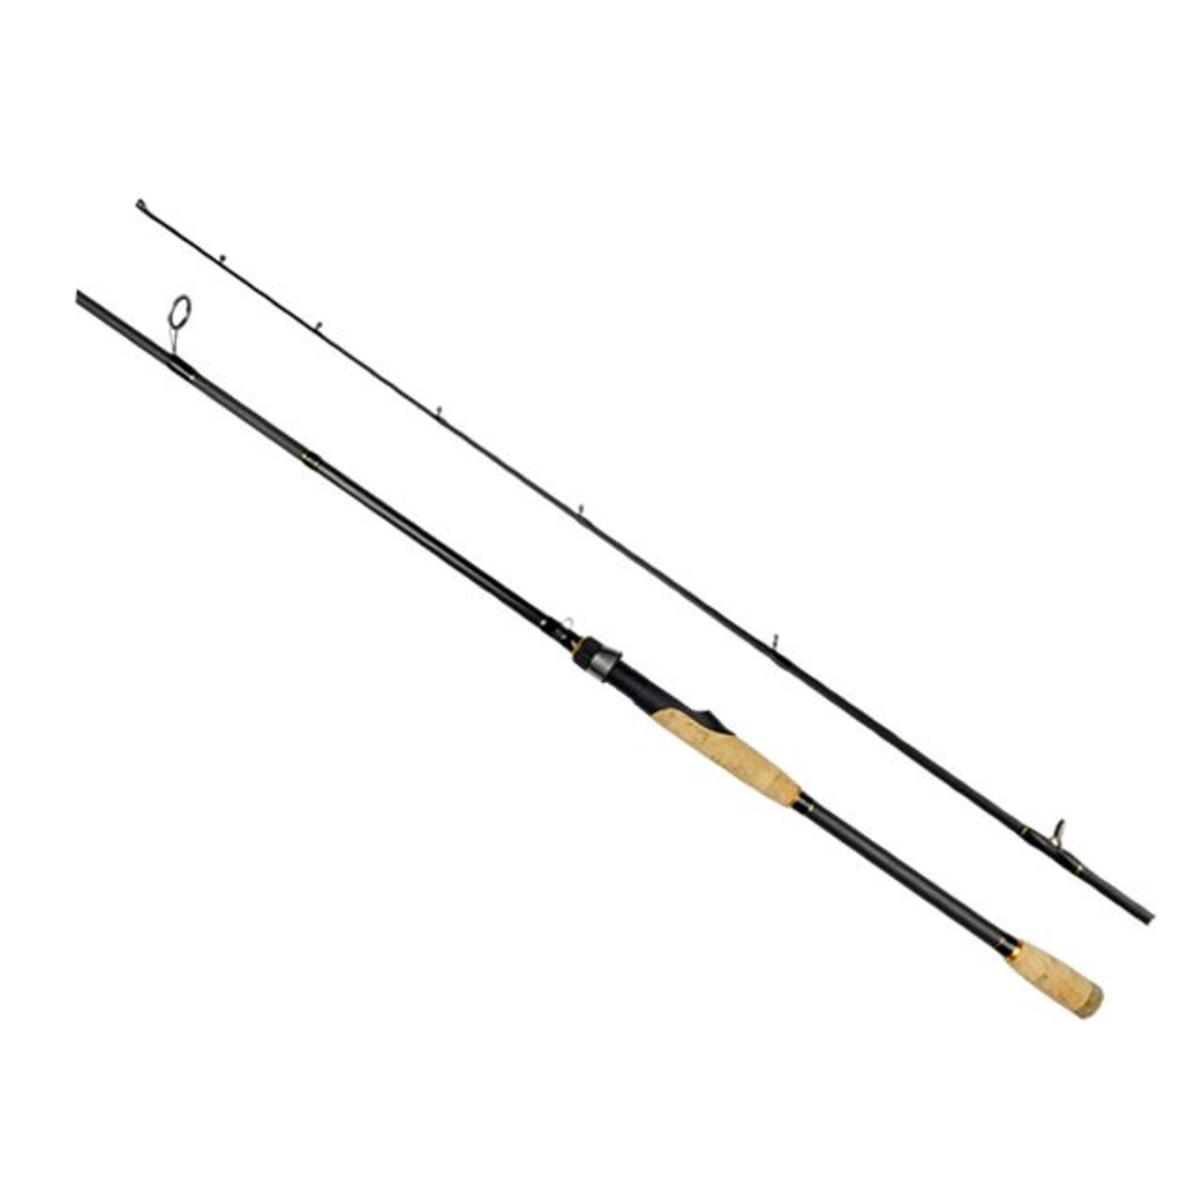 Vara Lumis Intense 631 (1,89m) 6-17Lb Para Molinete Inteiriça  - Pesca Adventure